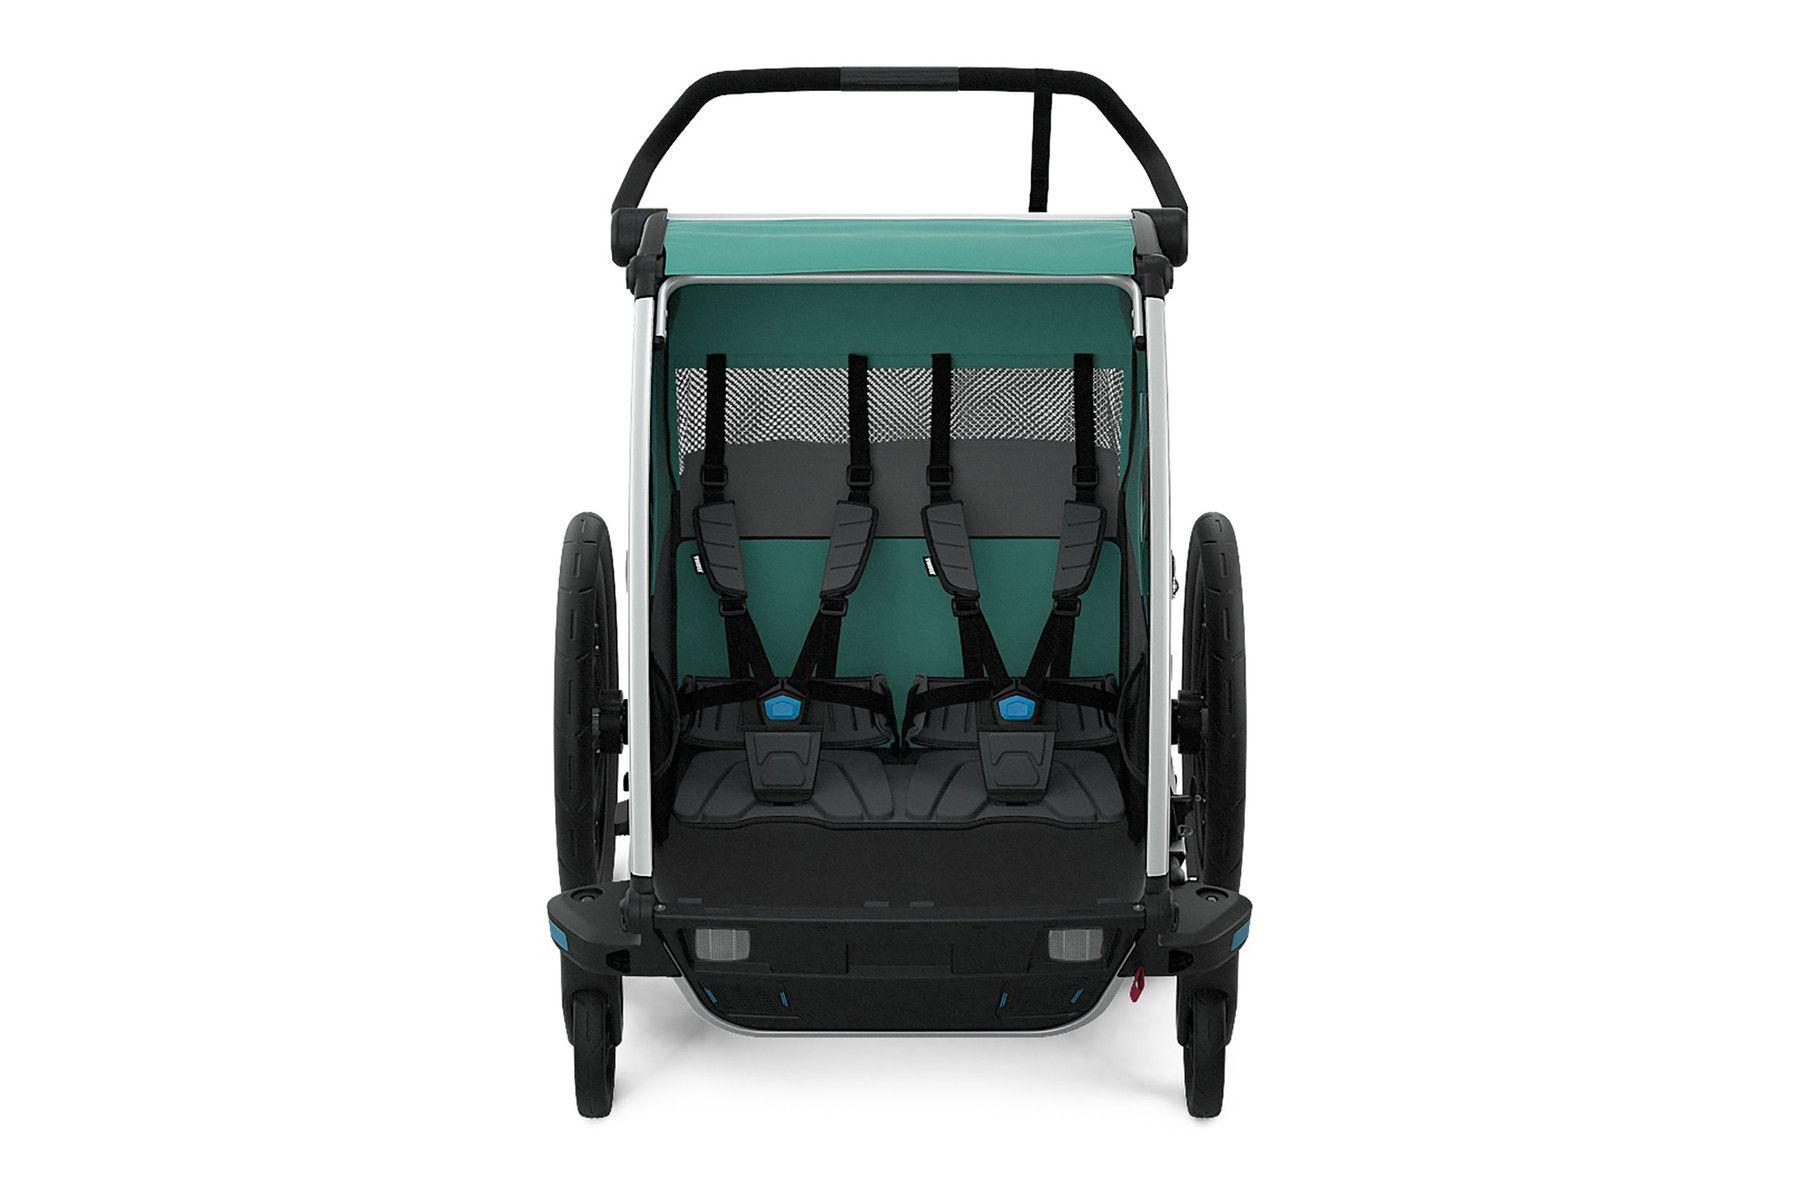 Thule Chariot Lite 2 In 2020 Thule Chariot Thule Bike Child Bike Seat